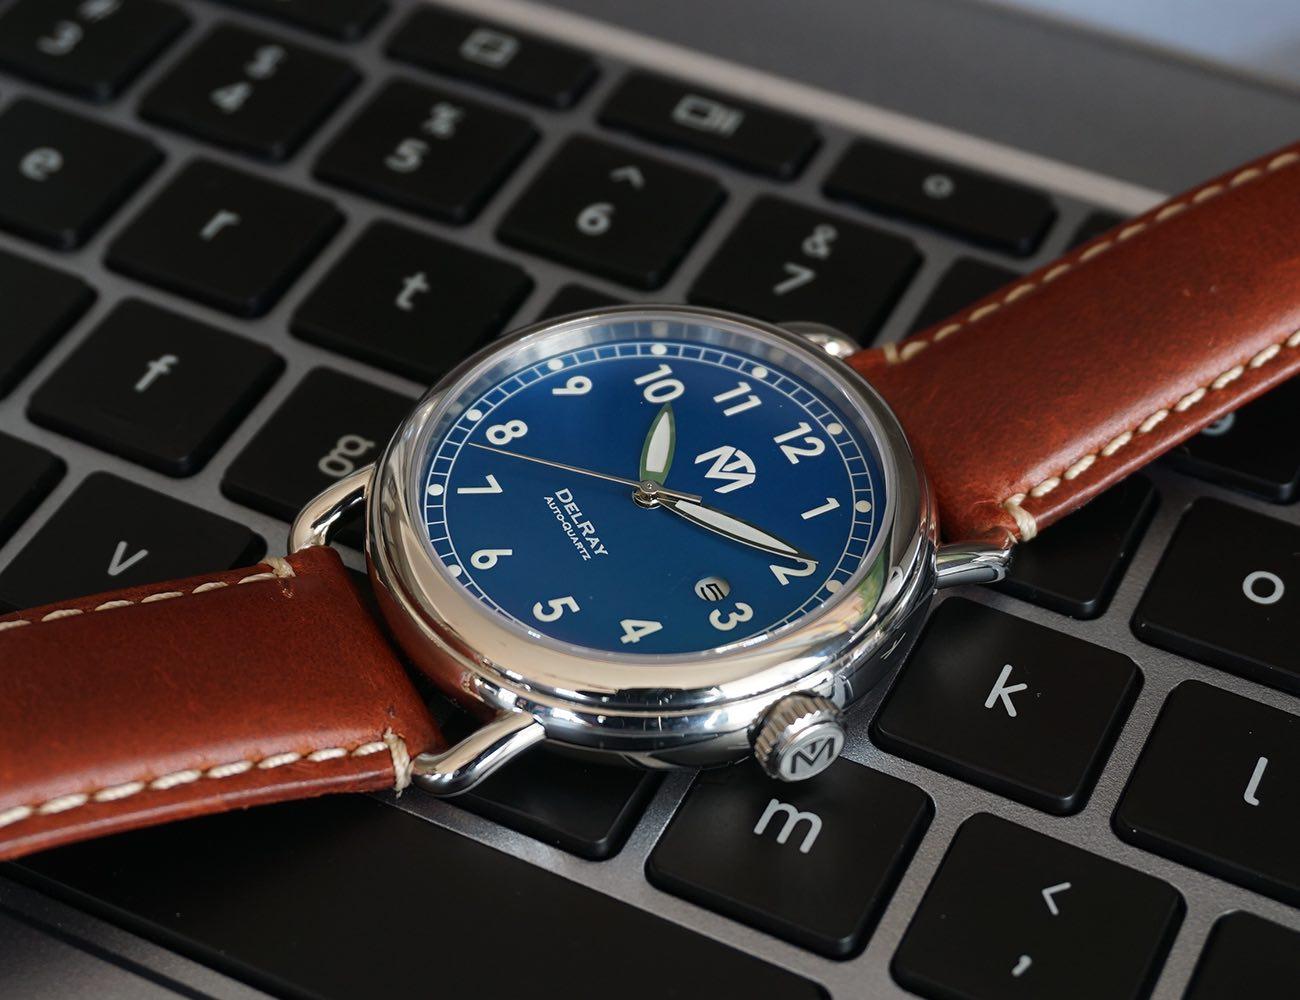 McDowell+Time+DelRay+Auto-Quartz+Watch